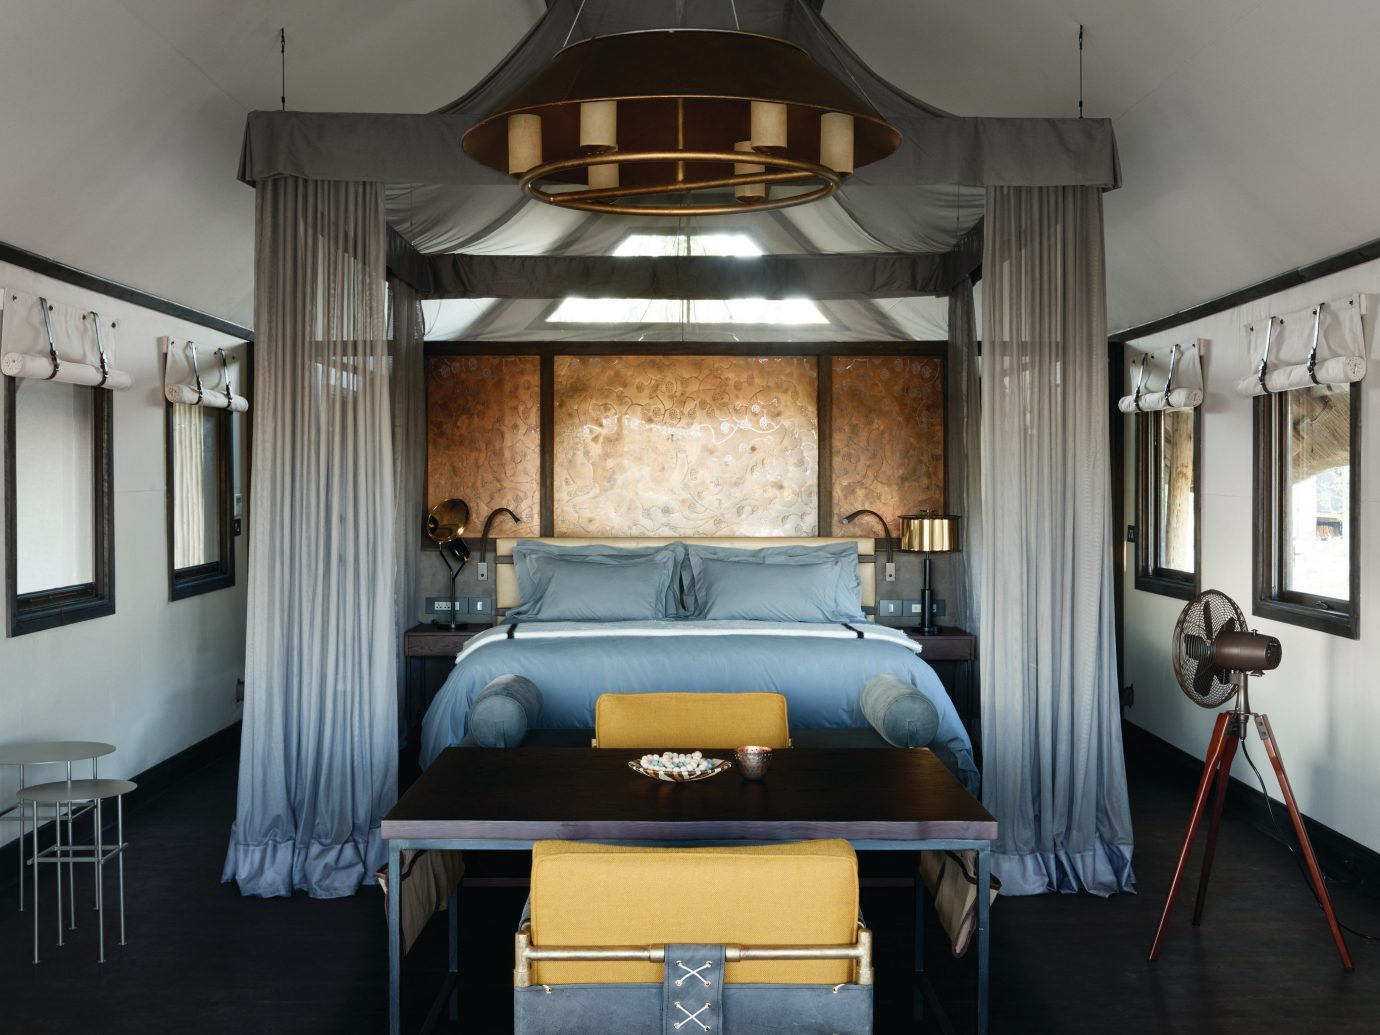 Trip Ideas indoor wall floor room interior design ceiling furniture Bedroom